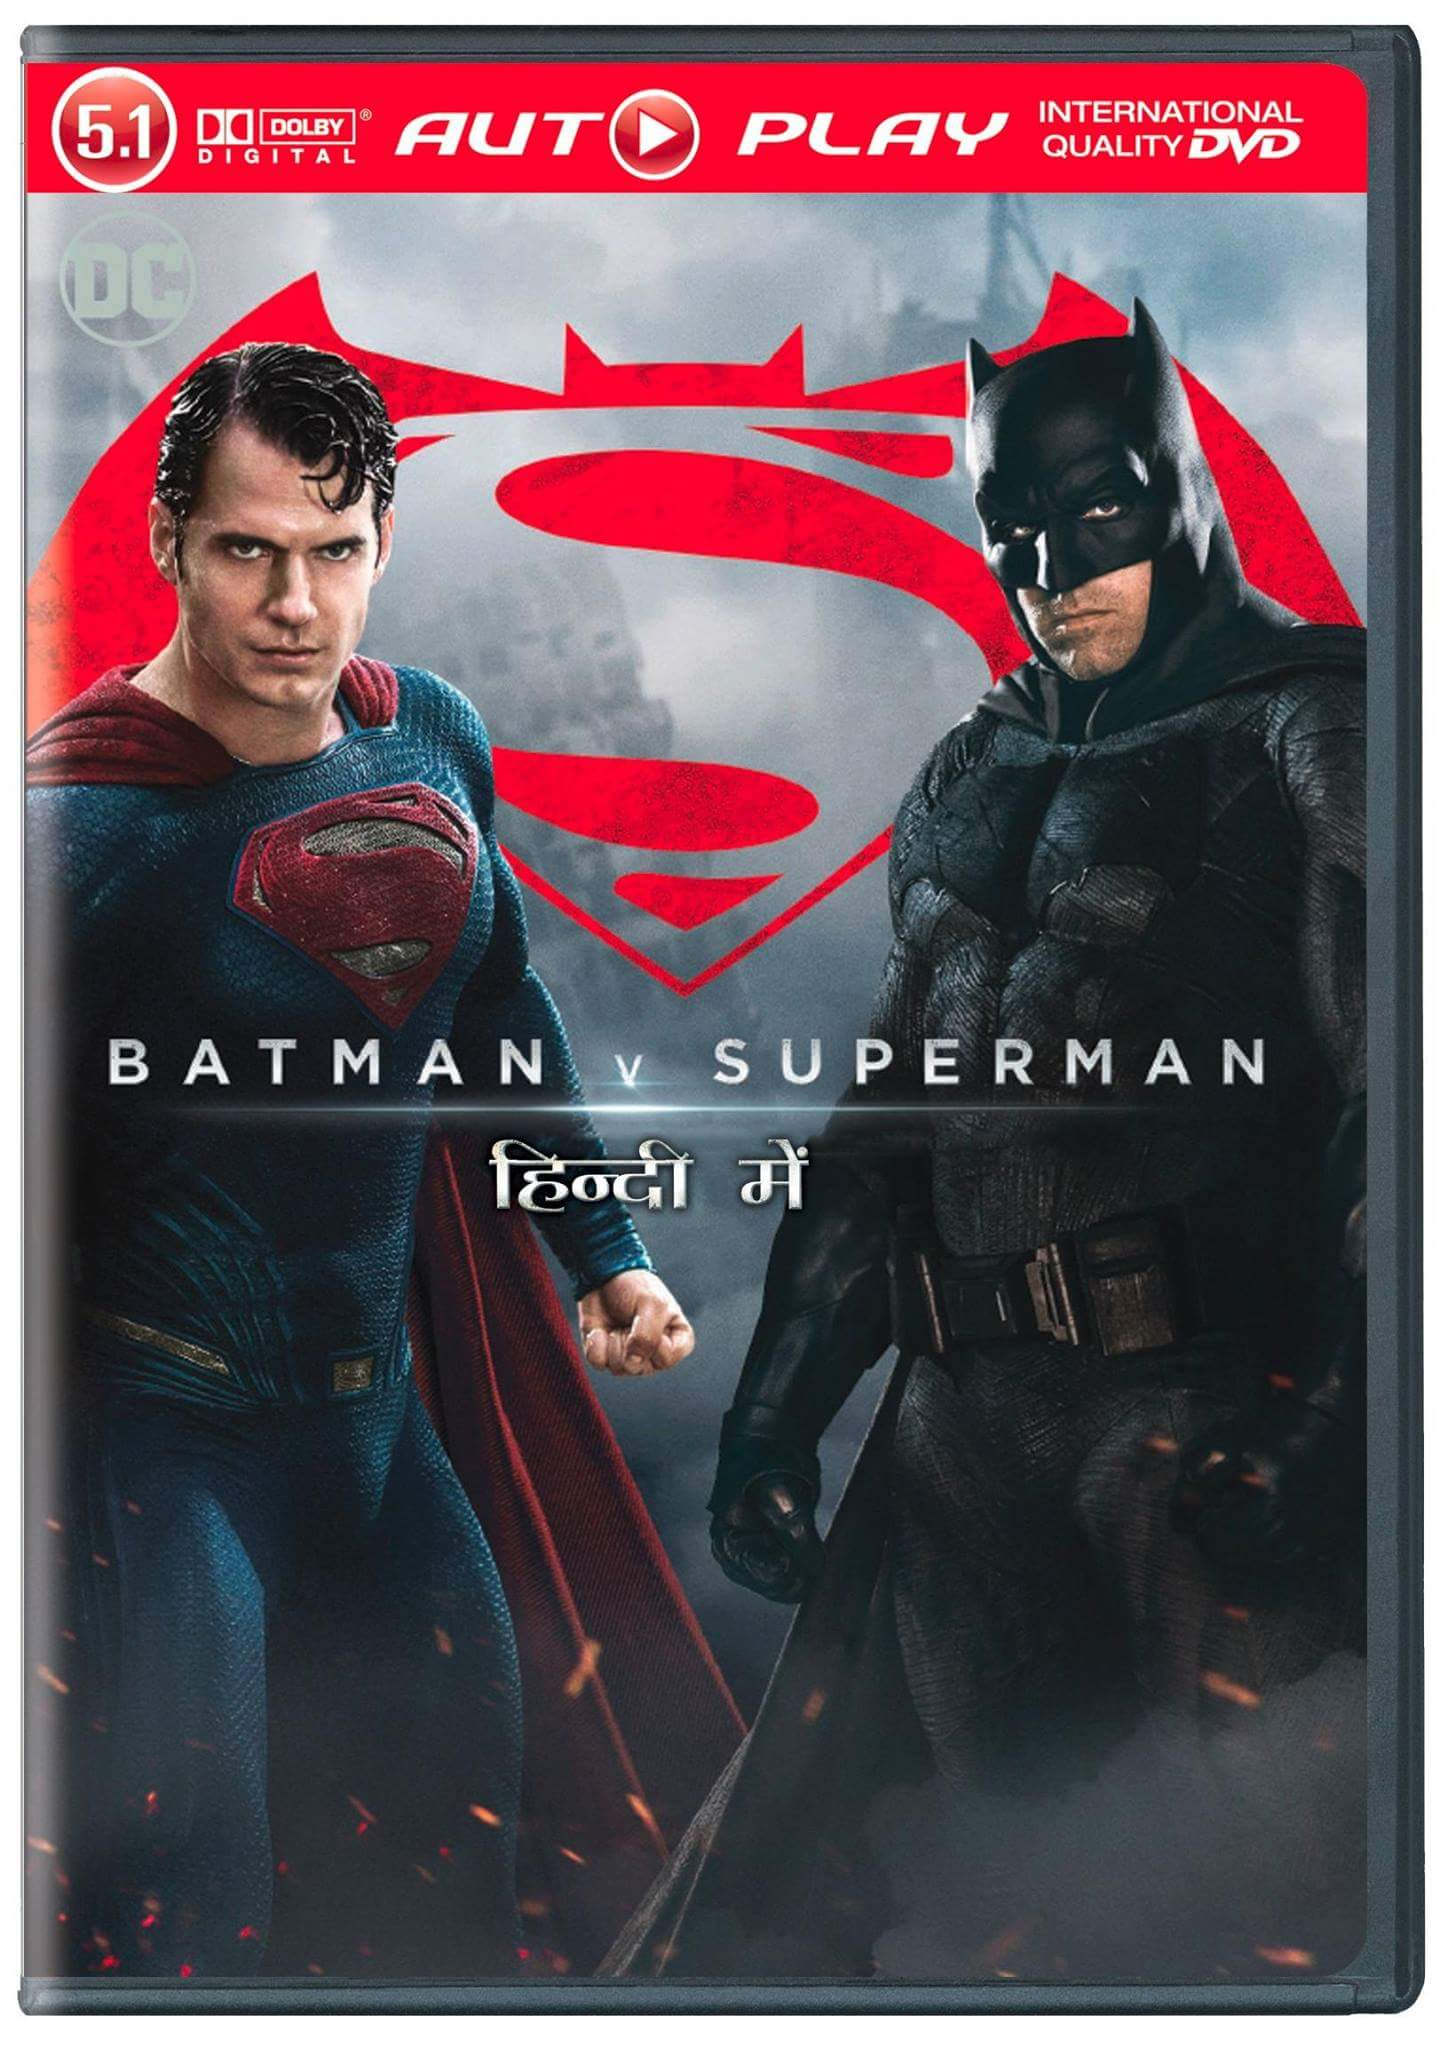 Batman v superman dawn of justice hindi dubbing wiki fandom powered by wikia